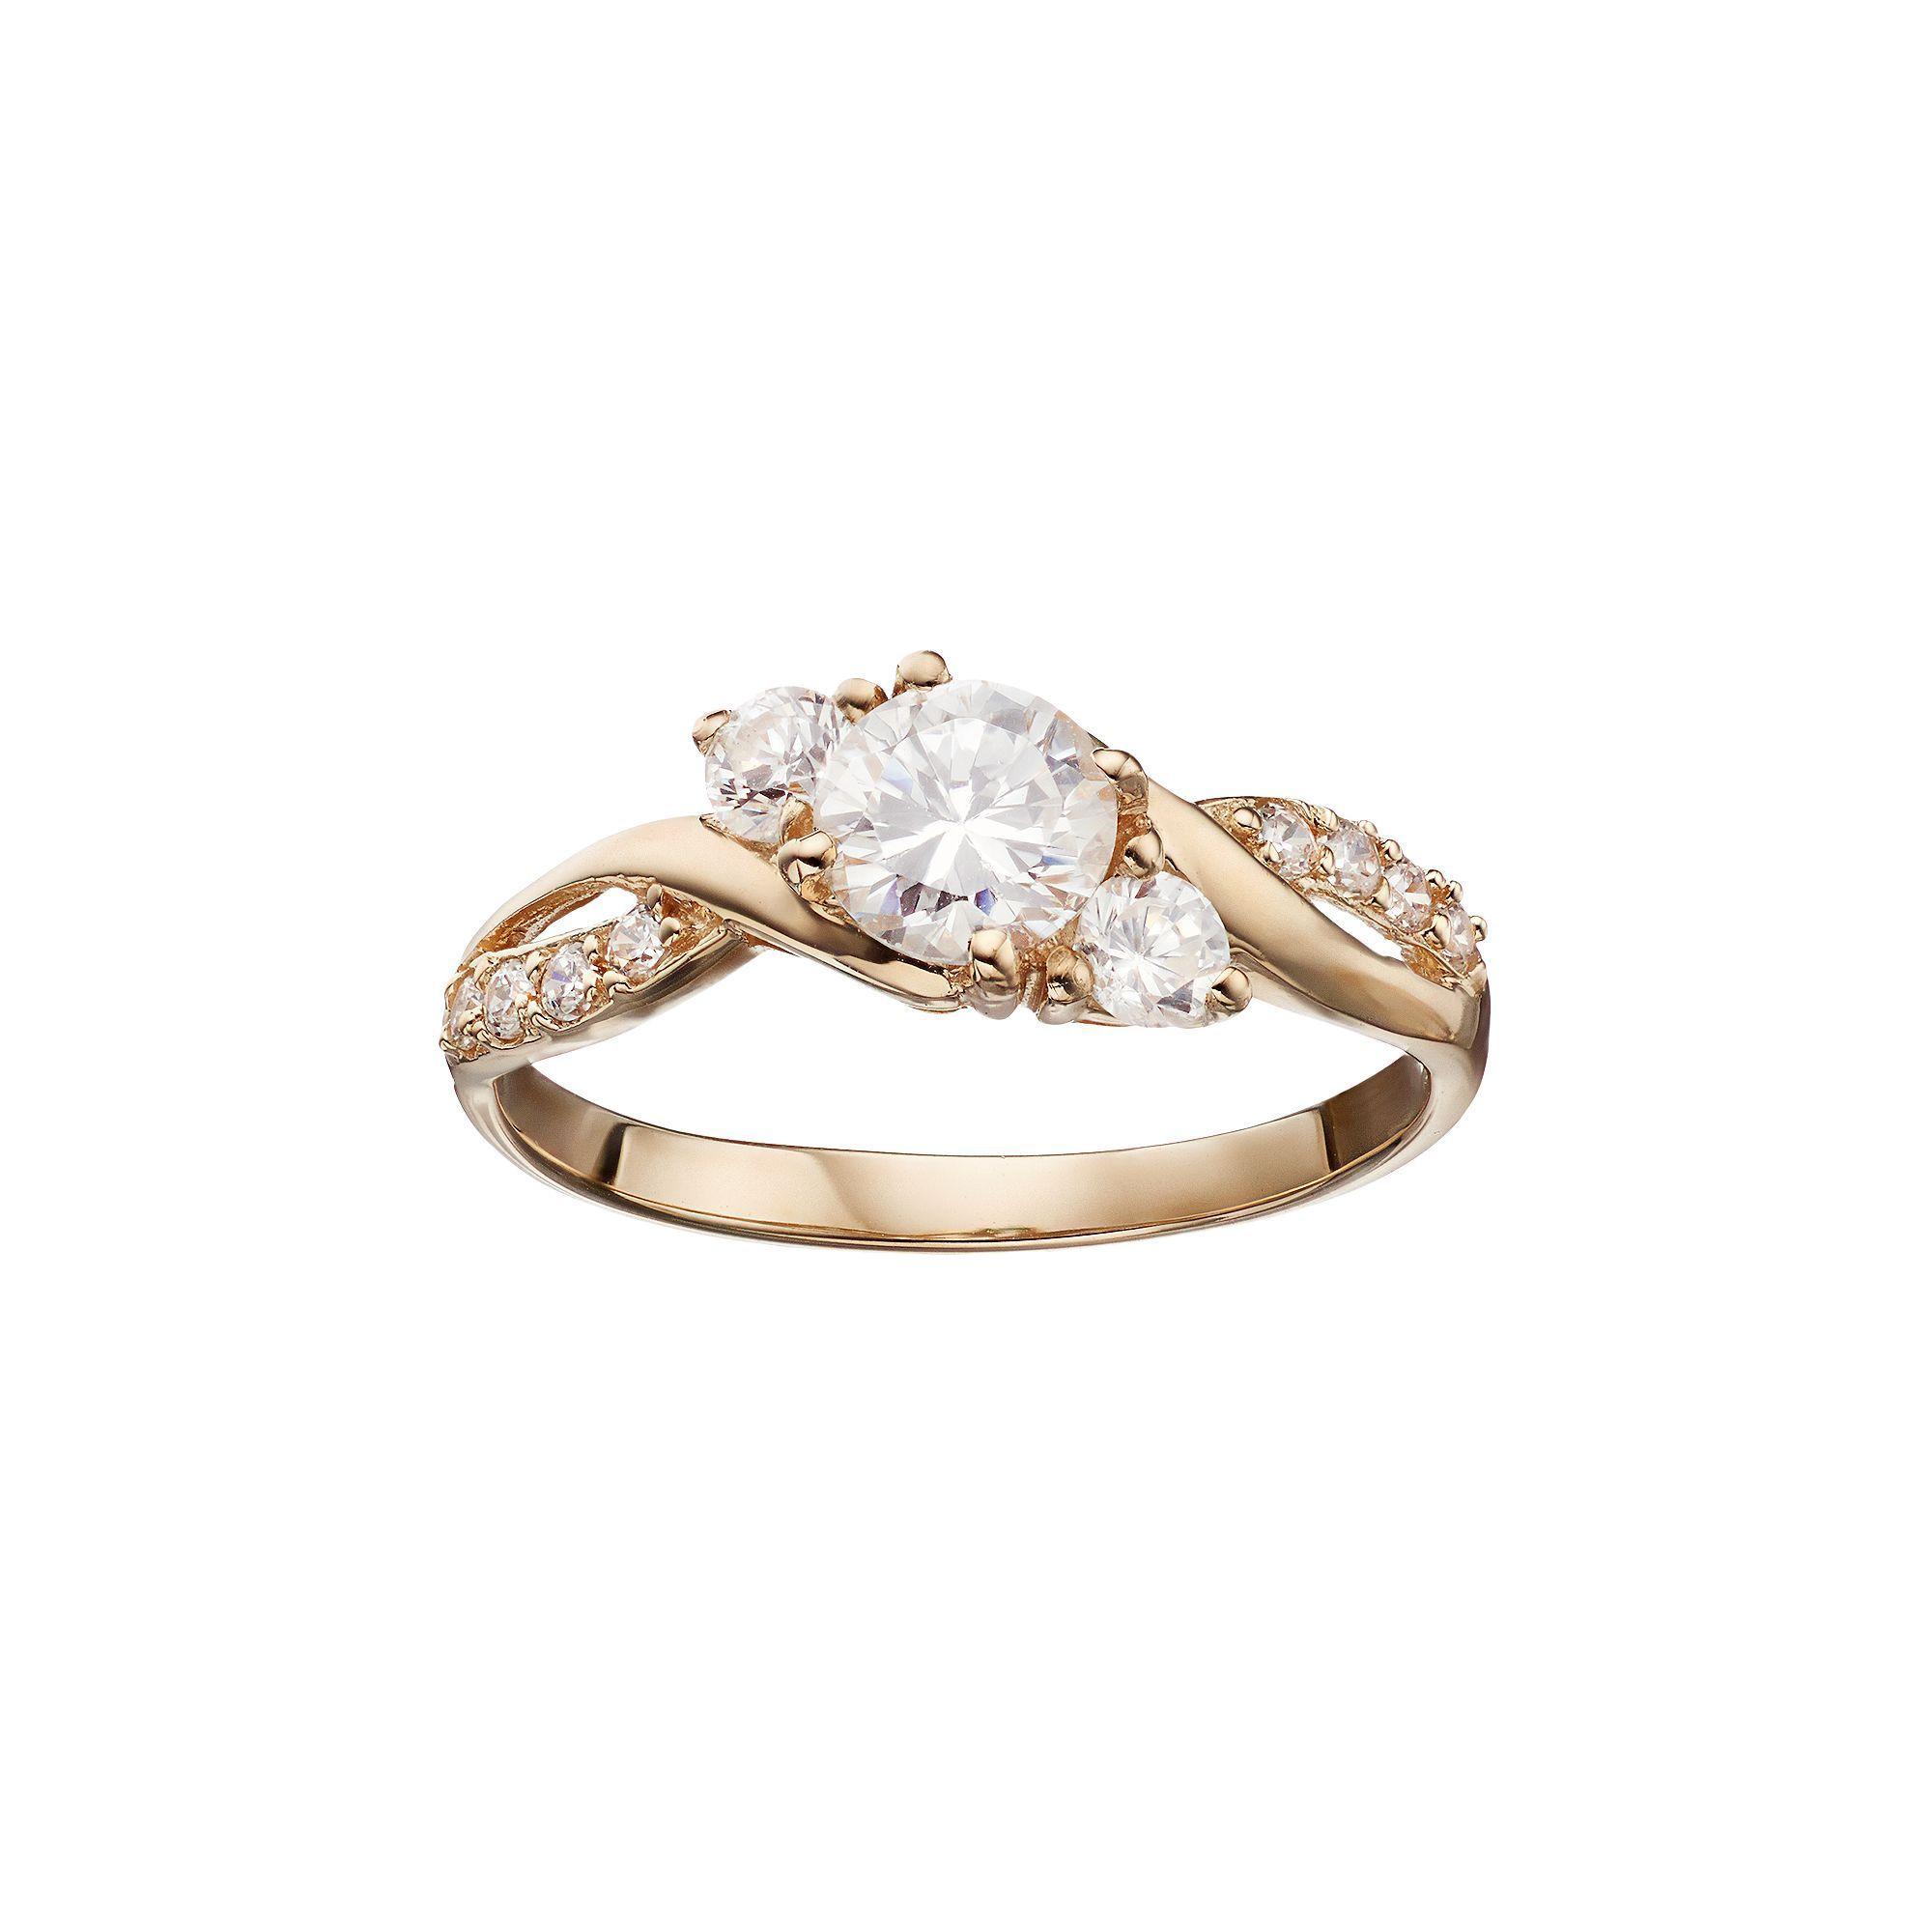 da94fb16ab9aed 10k Gold Swarovski Zirconia Round-Cut Halo Ring Brooches & Pins Bands